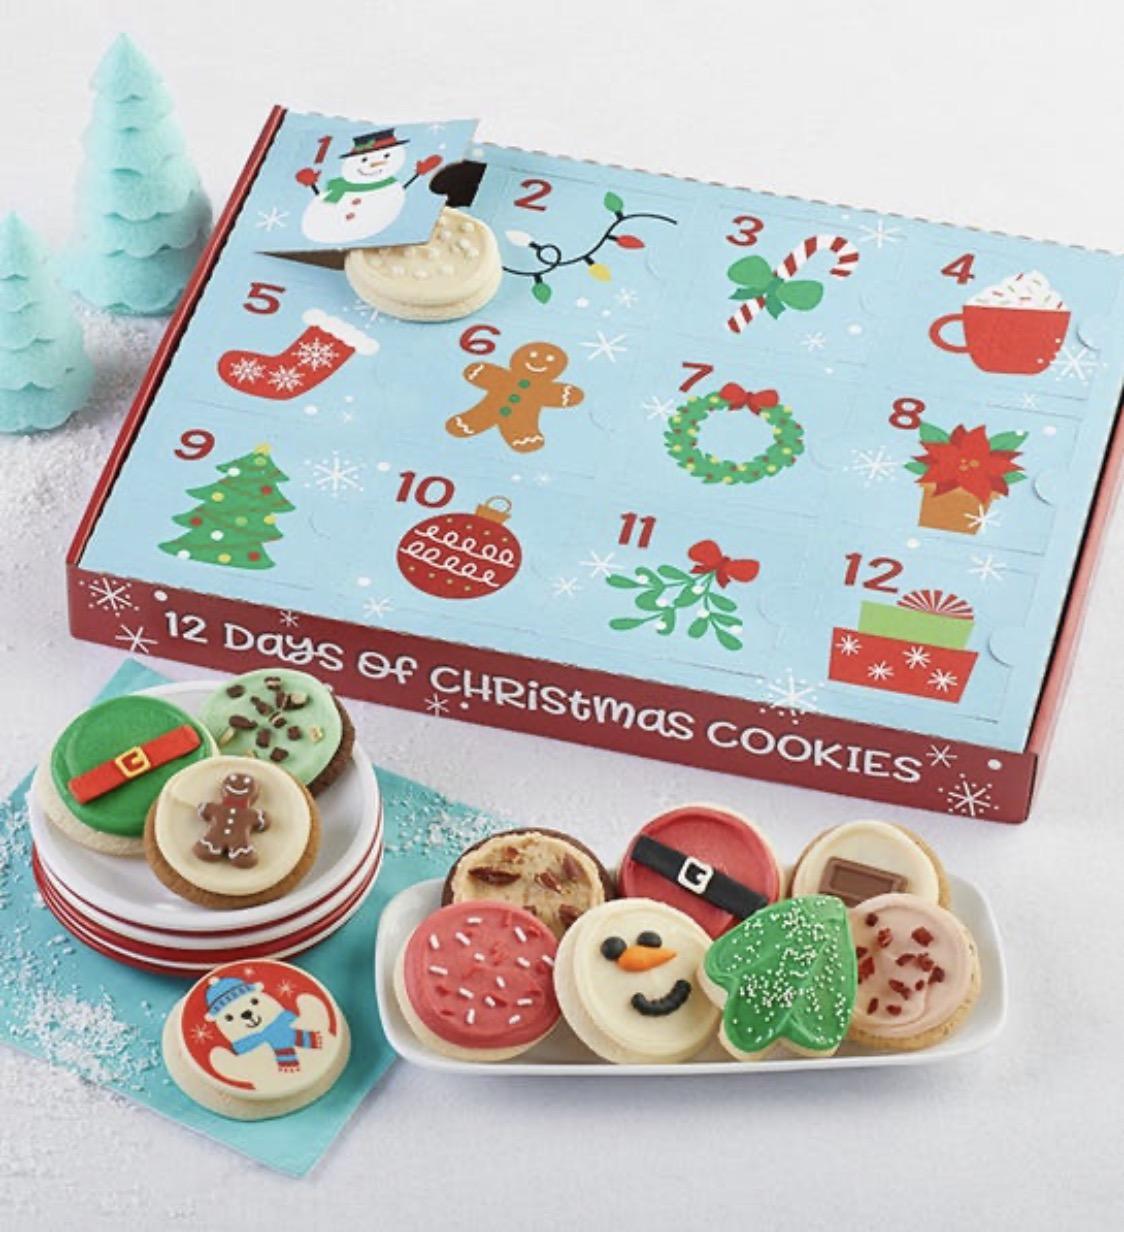 Cheryl's Cookies 12 Days of Christmas Advent Calendar Gift Box